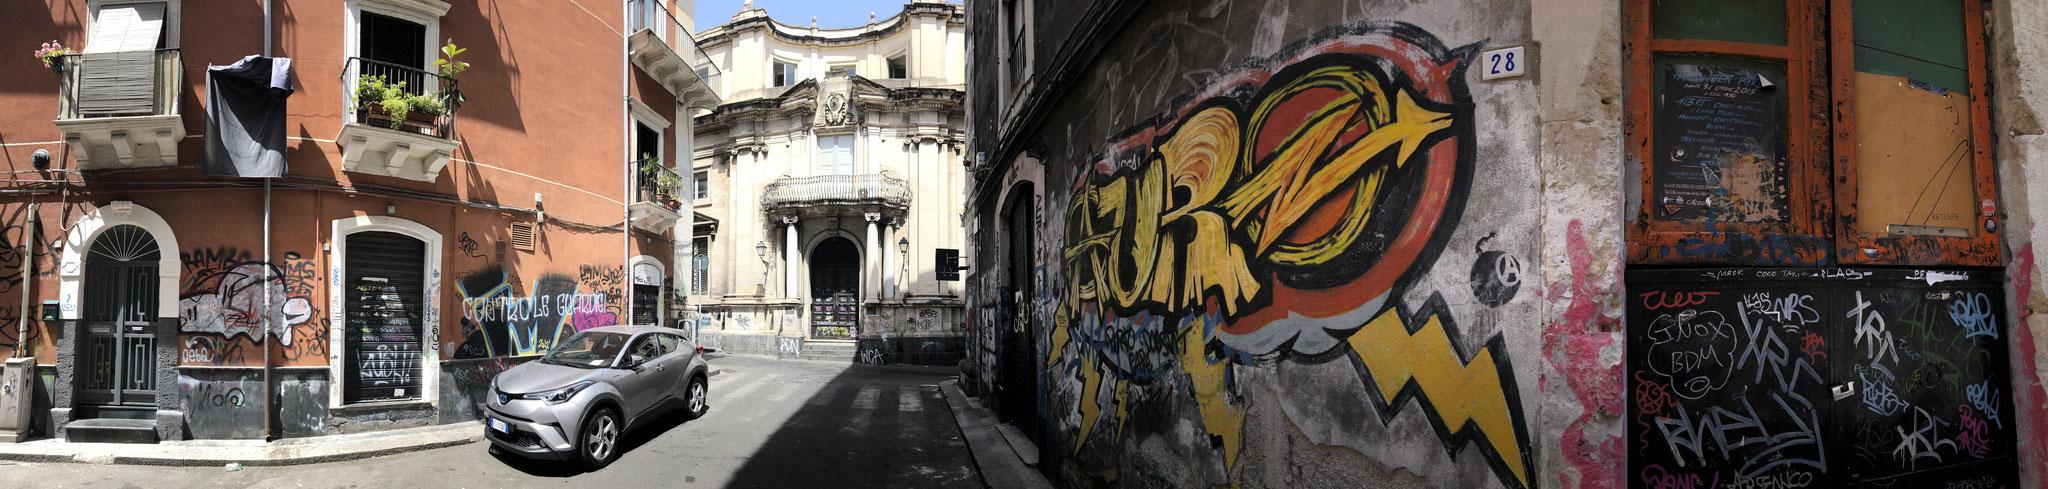 Streets of Catania, Sicily, Italy (June 2019)